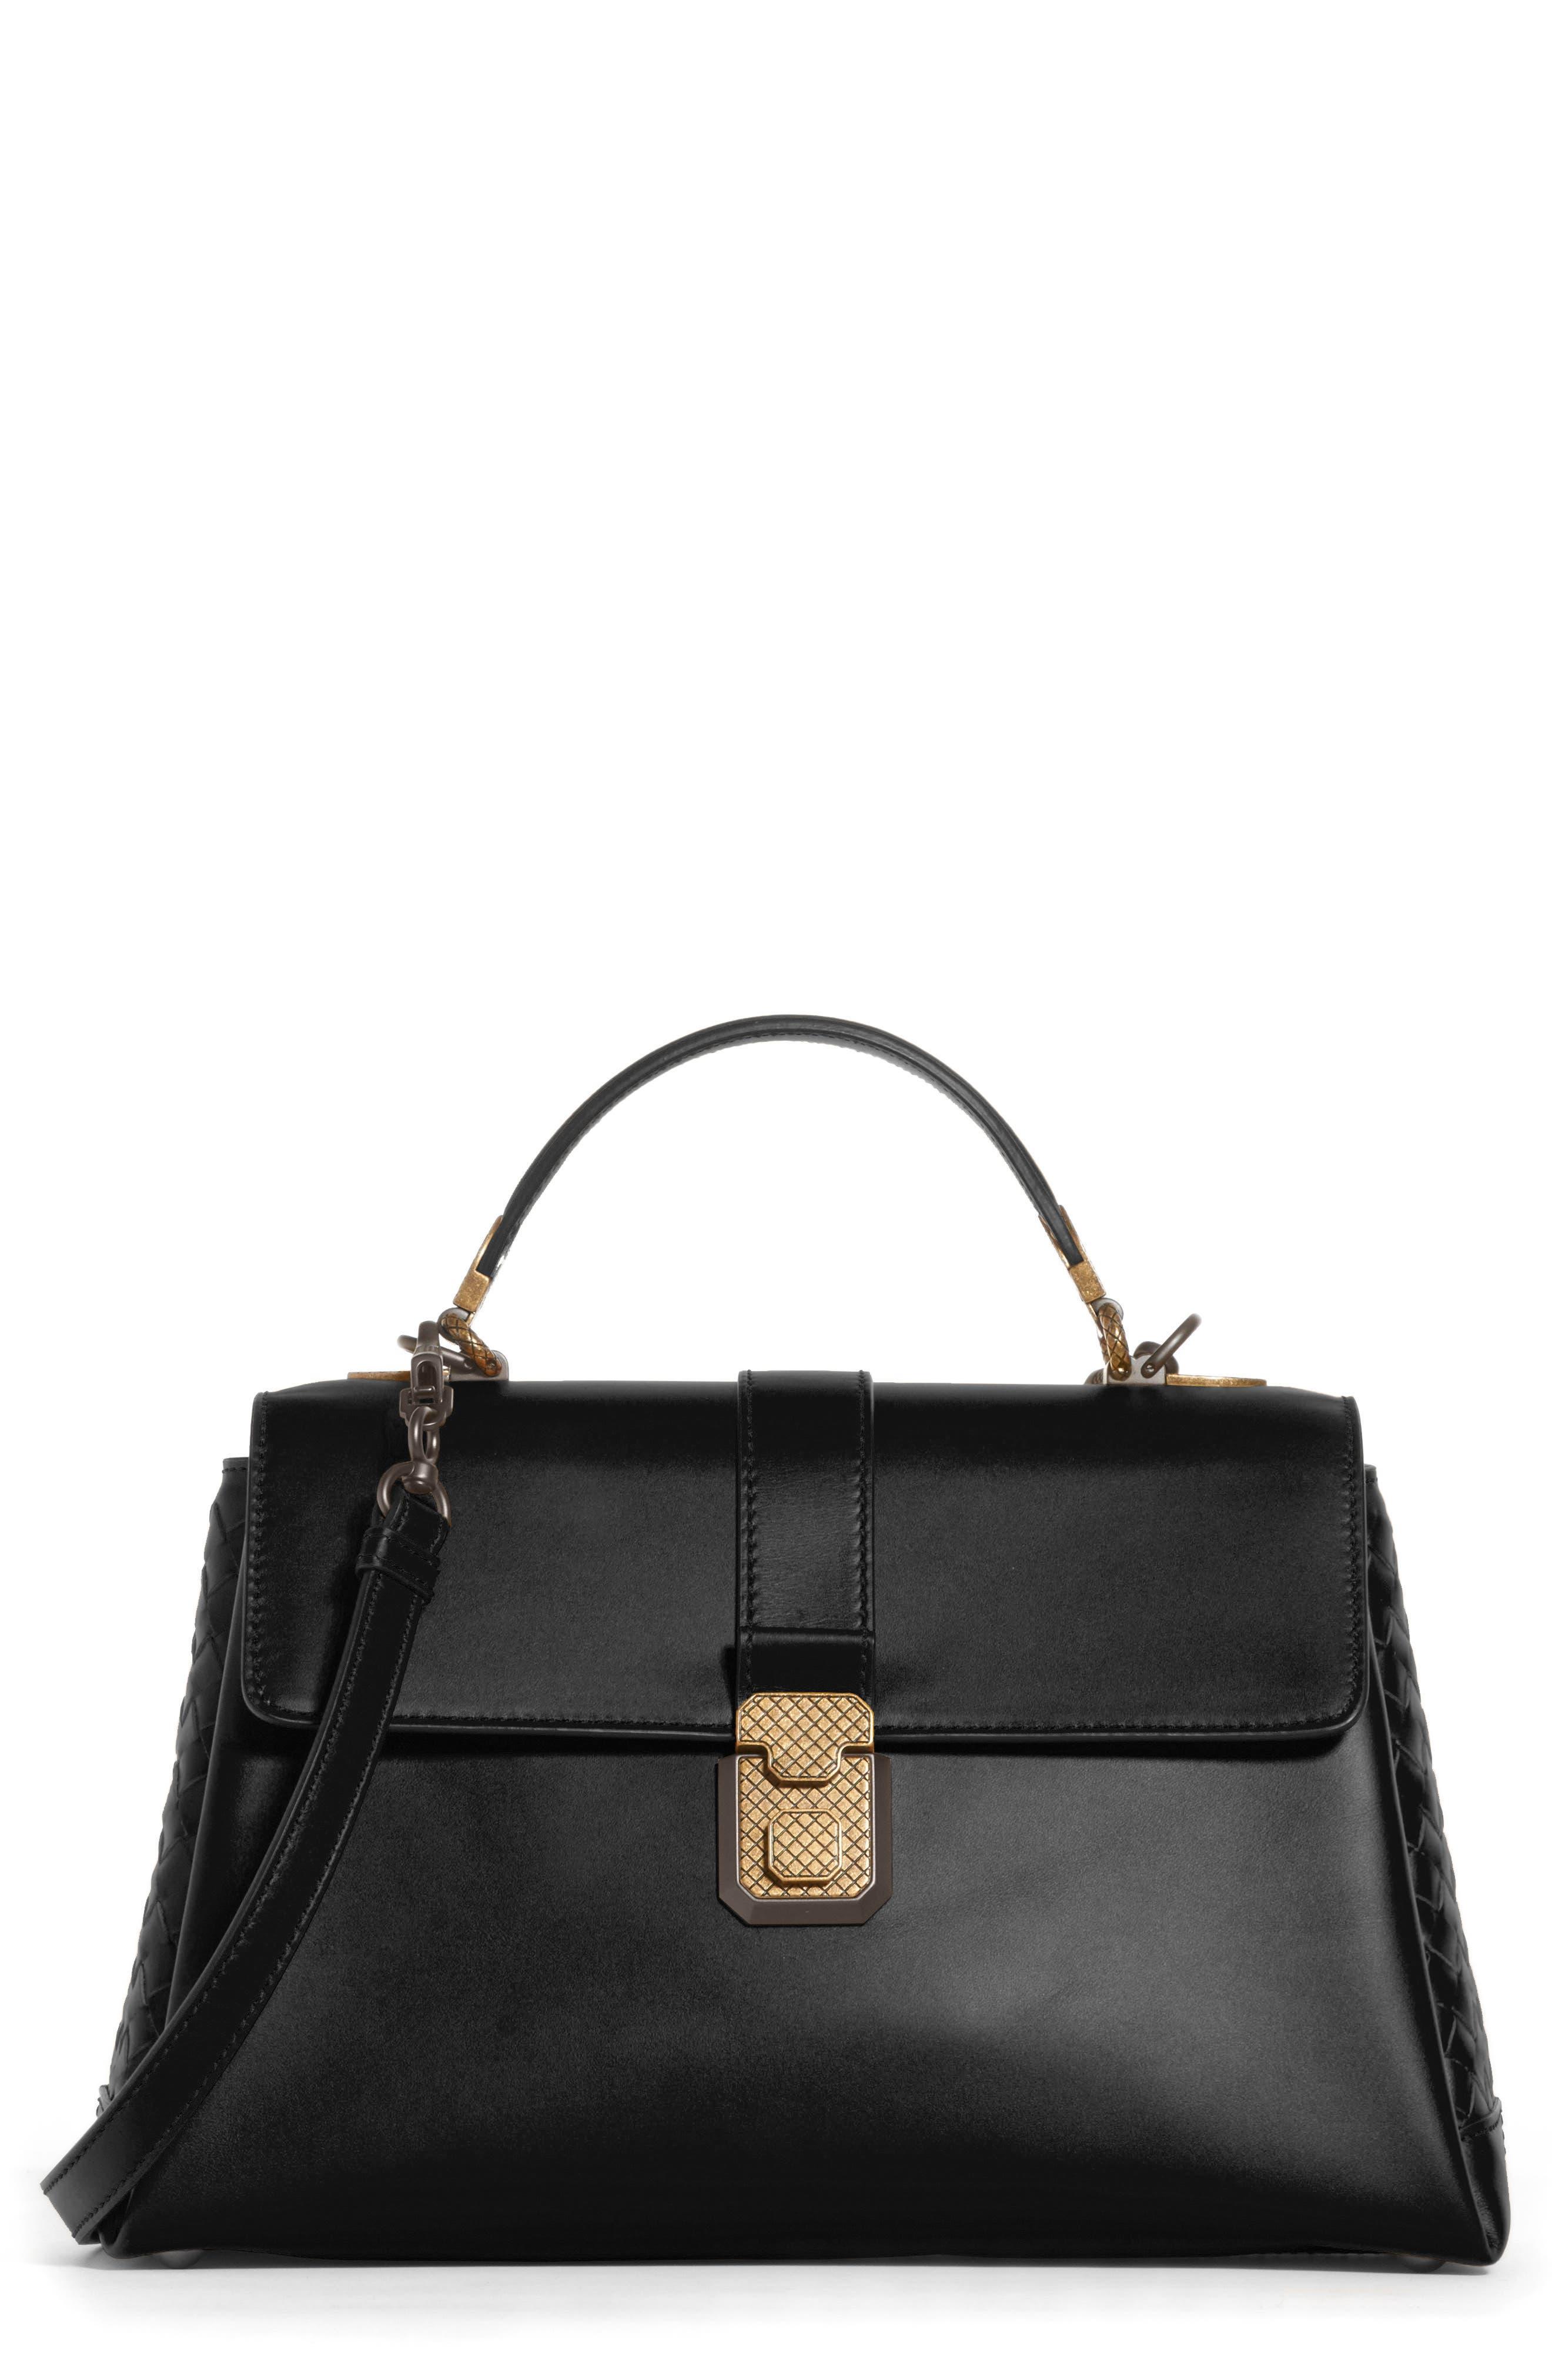 Bottega Veneta Medium Piazza Top Handle Bag